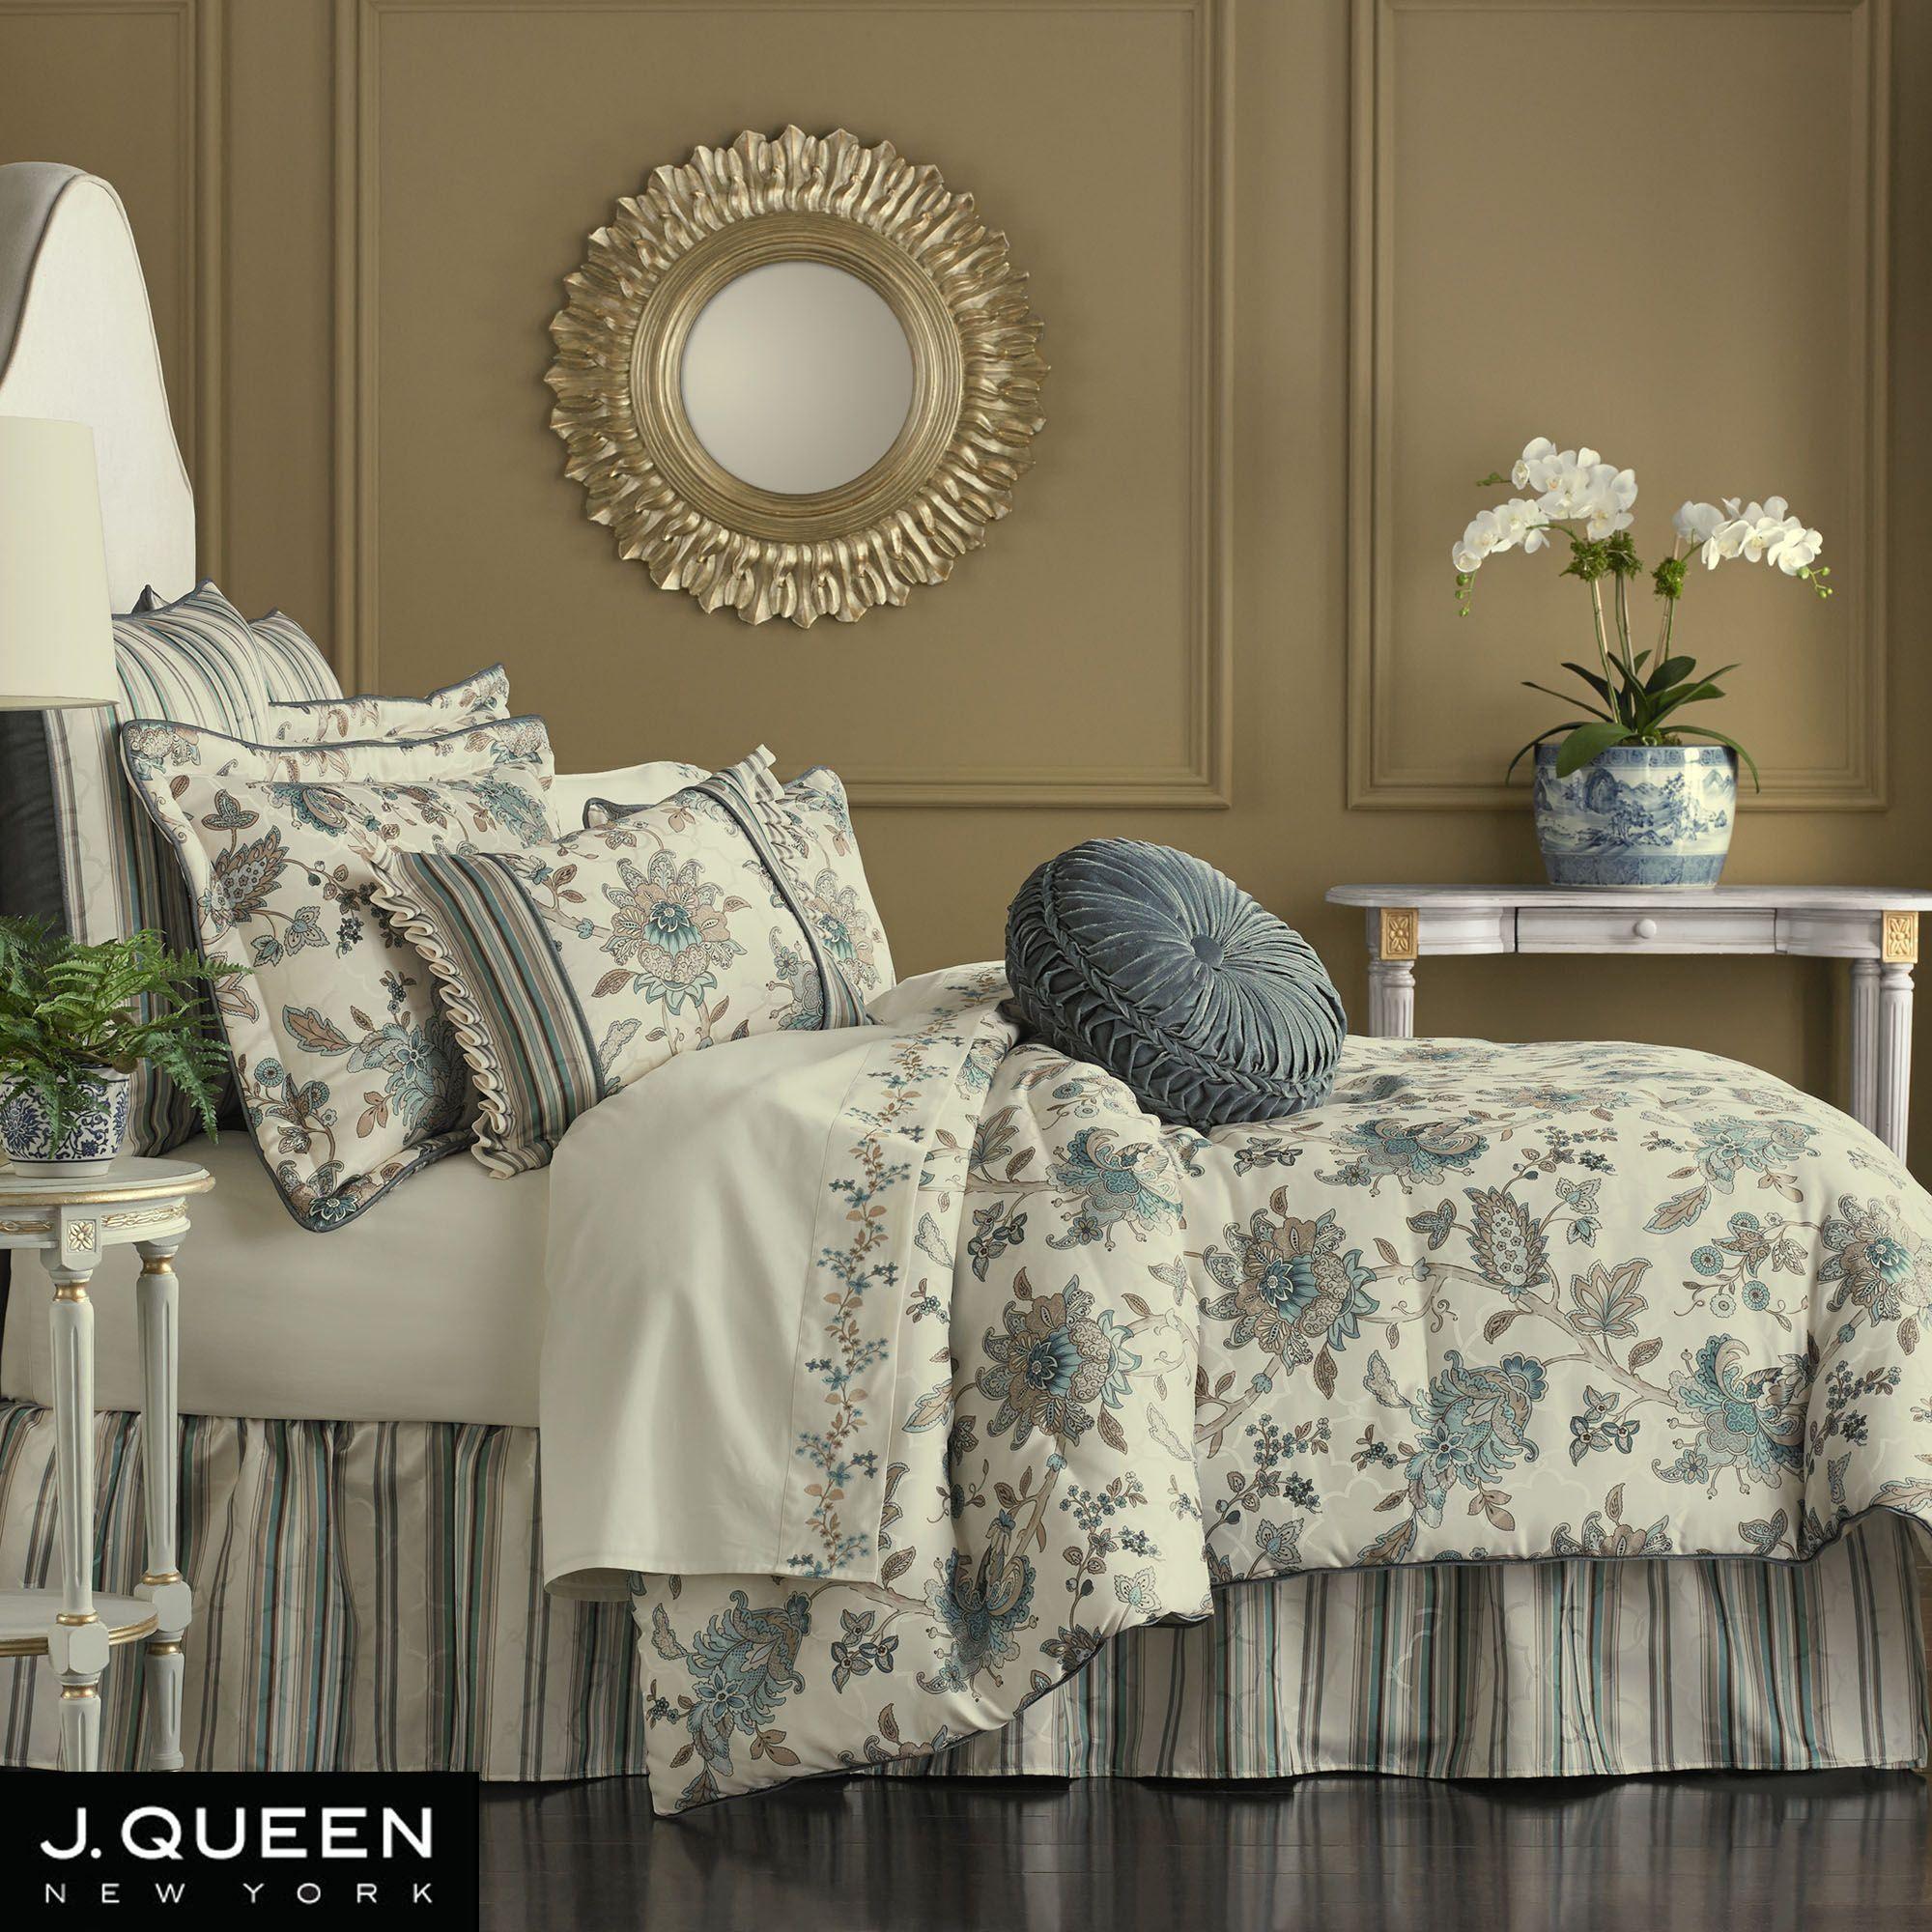 Adrianna Jacobean Comforter Bedding By J Queen New York